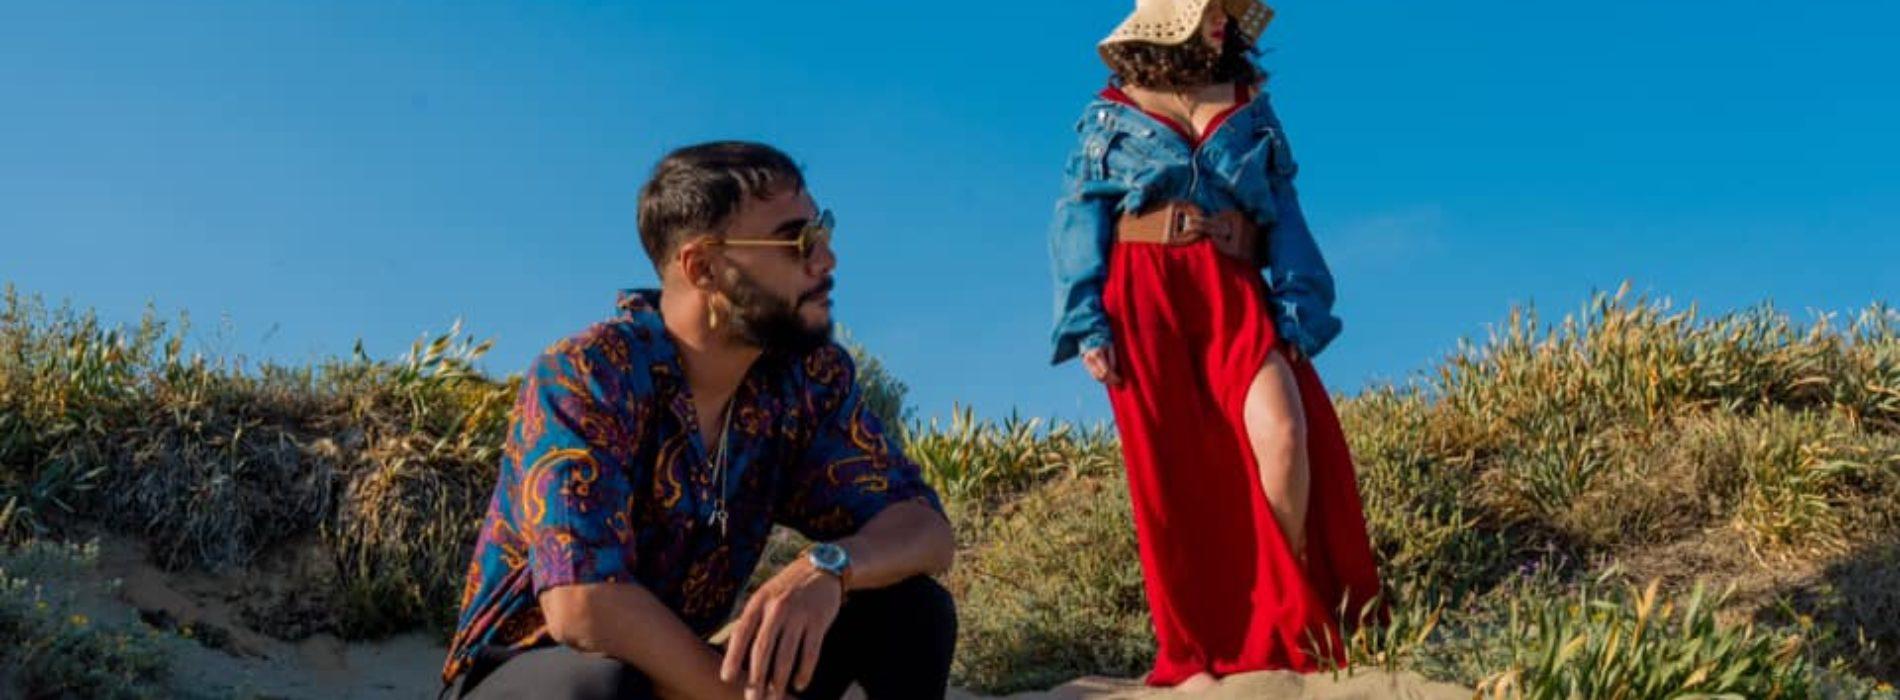 ISNEL – EL CHAPO – Juin 2019